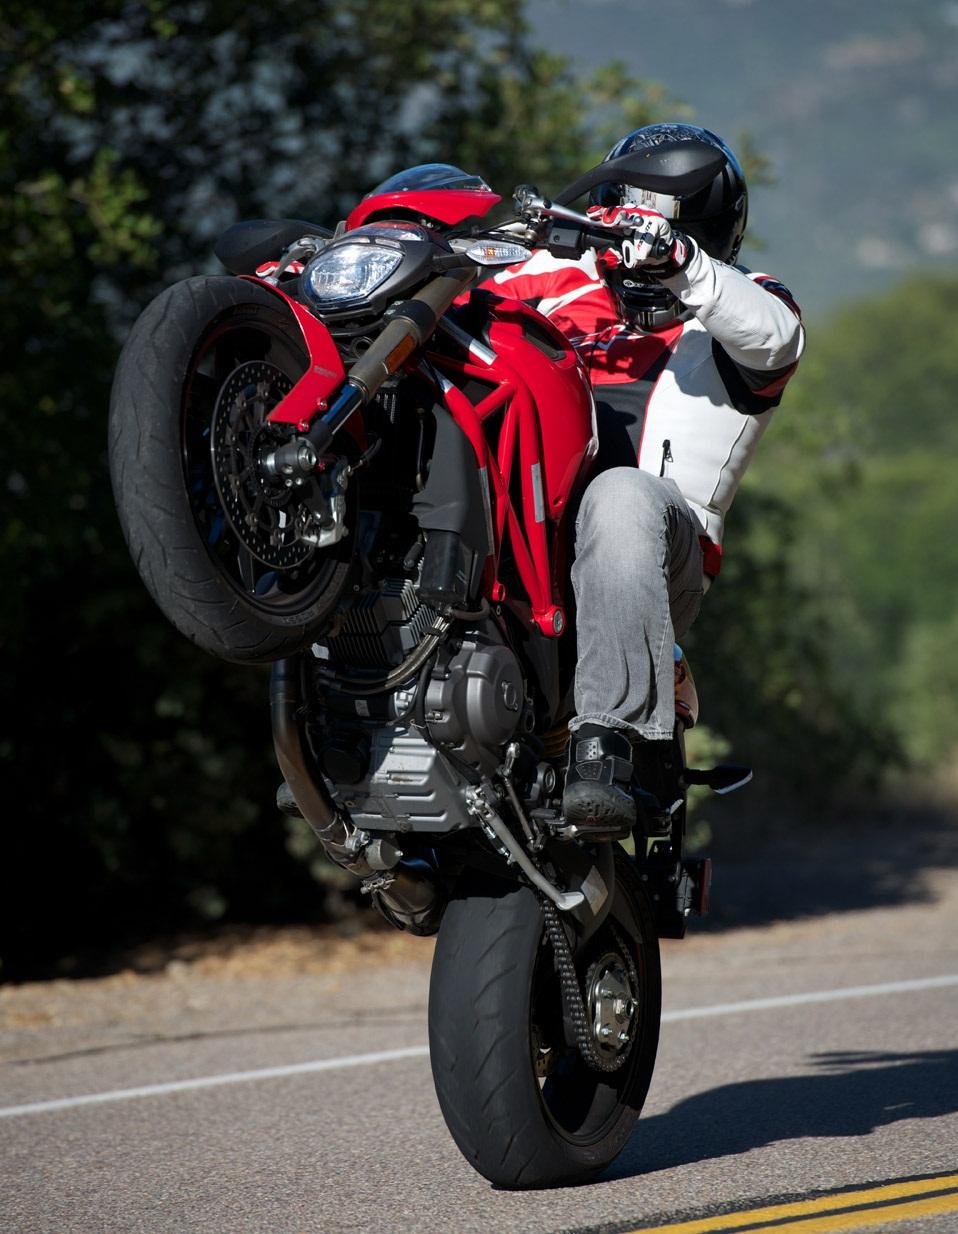 Sports Bike Blog,Latest Bikes,Bikes In 2012: 2012 Ducati